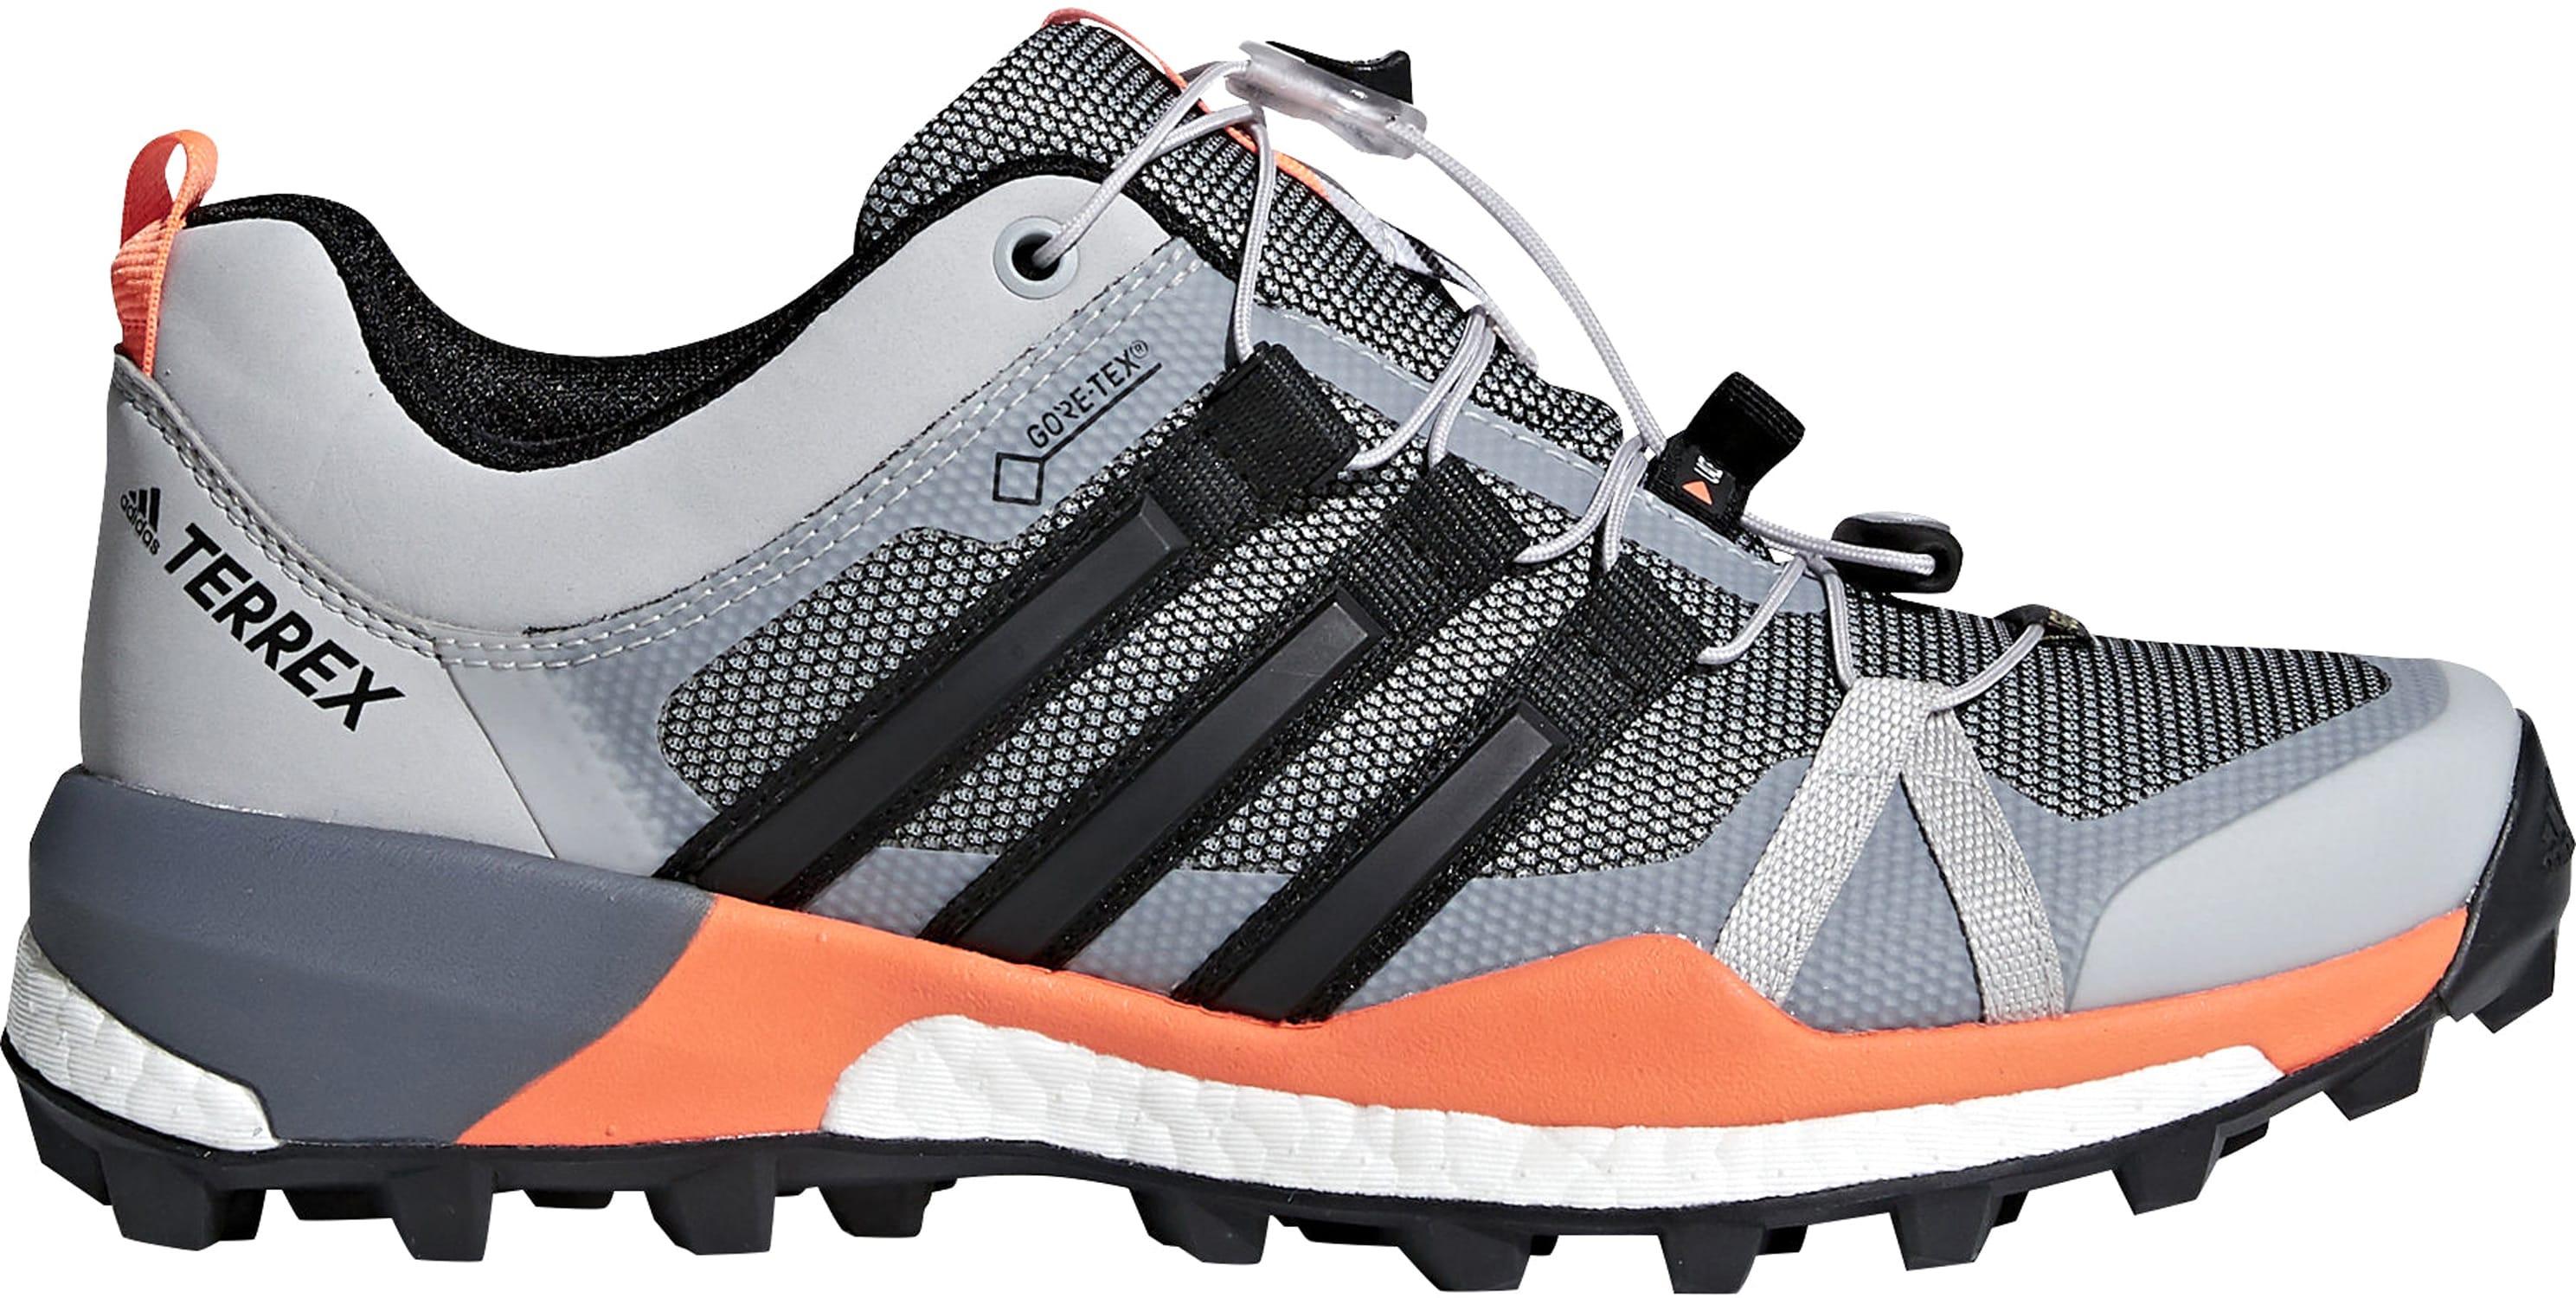 Adidas Terrex Skychaser Gtx Hiking Shoes Womens